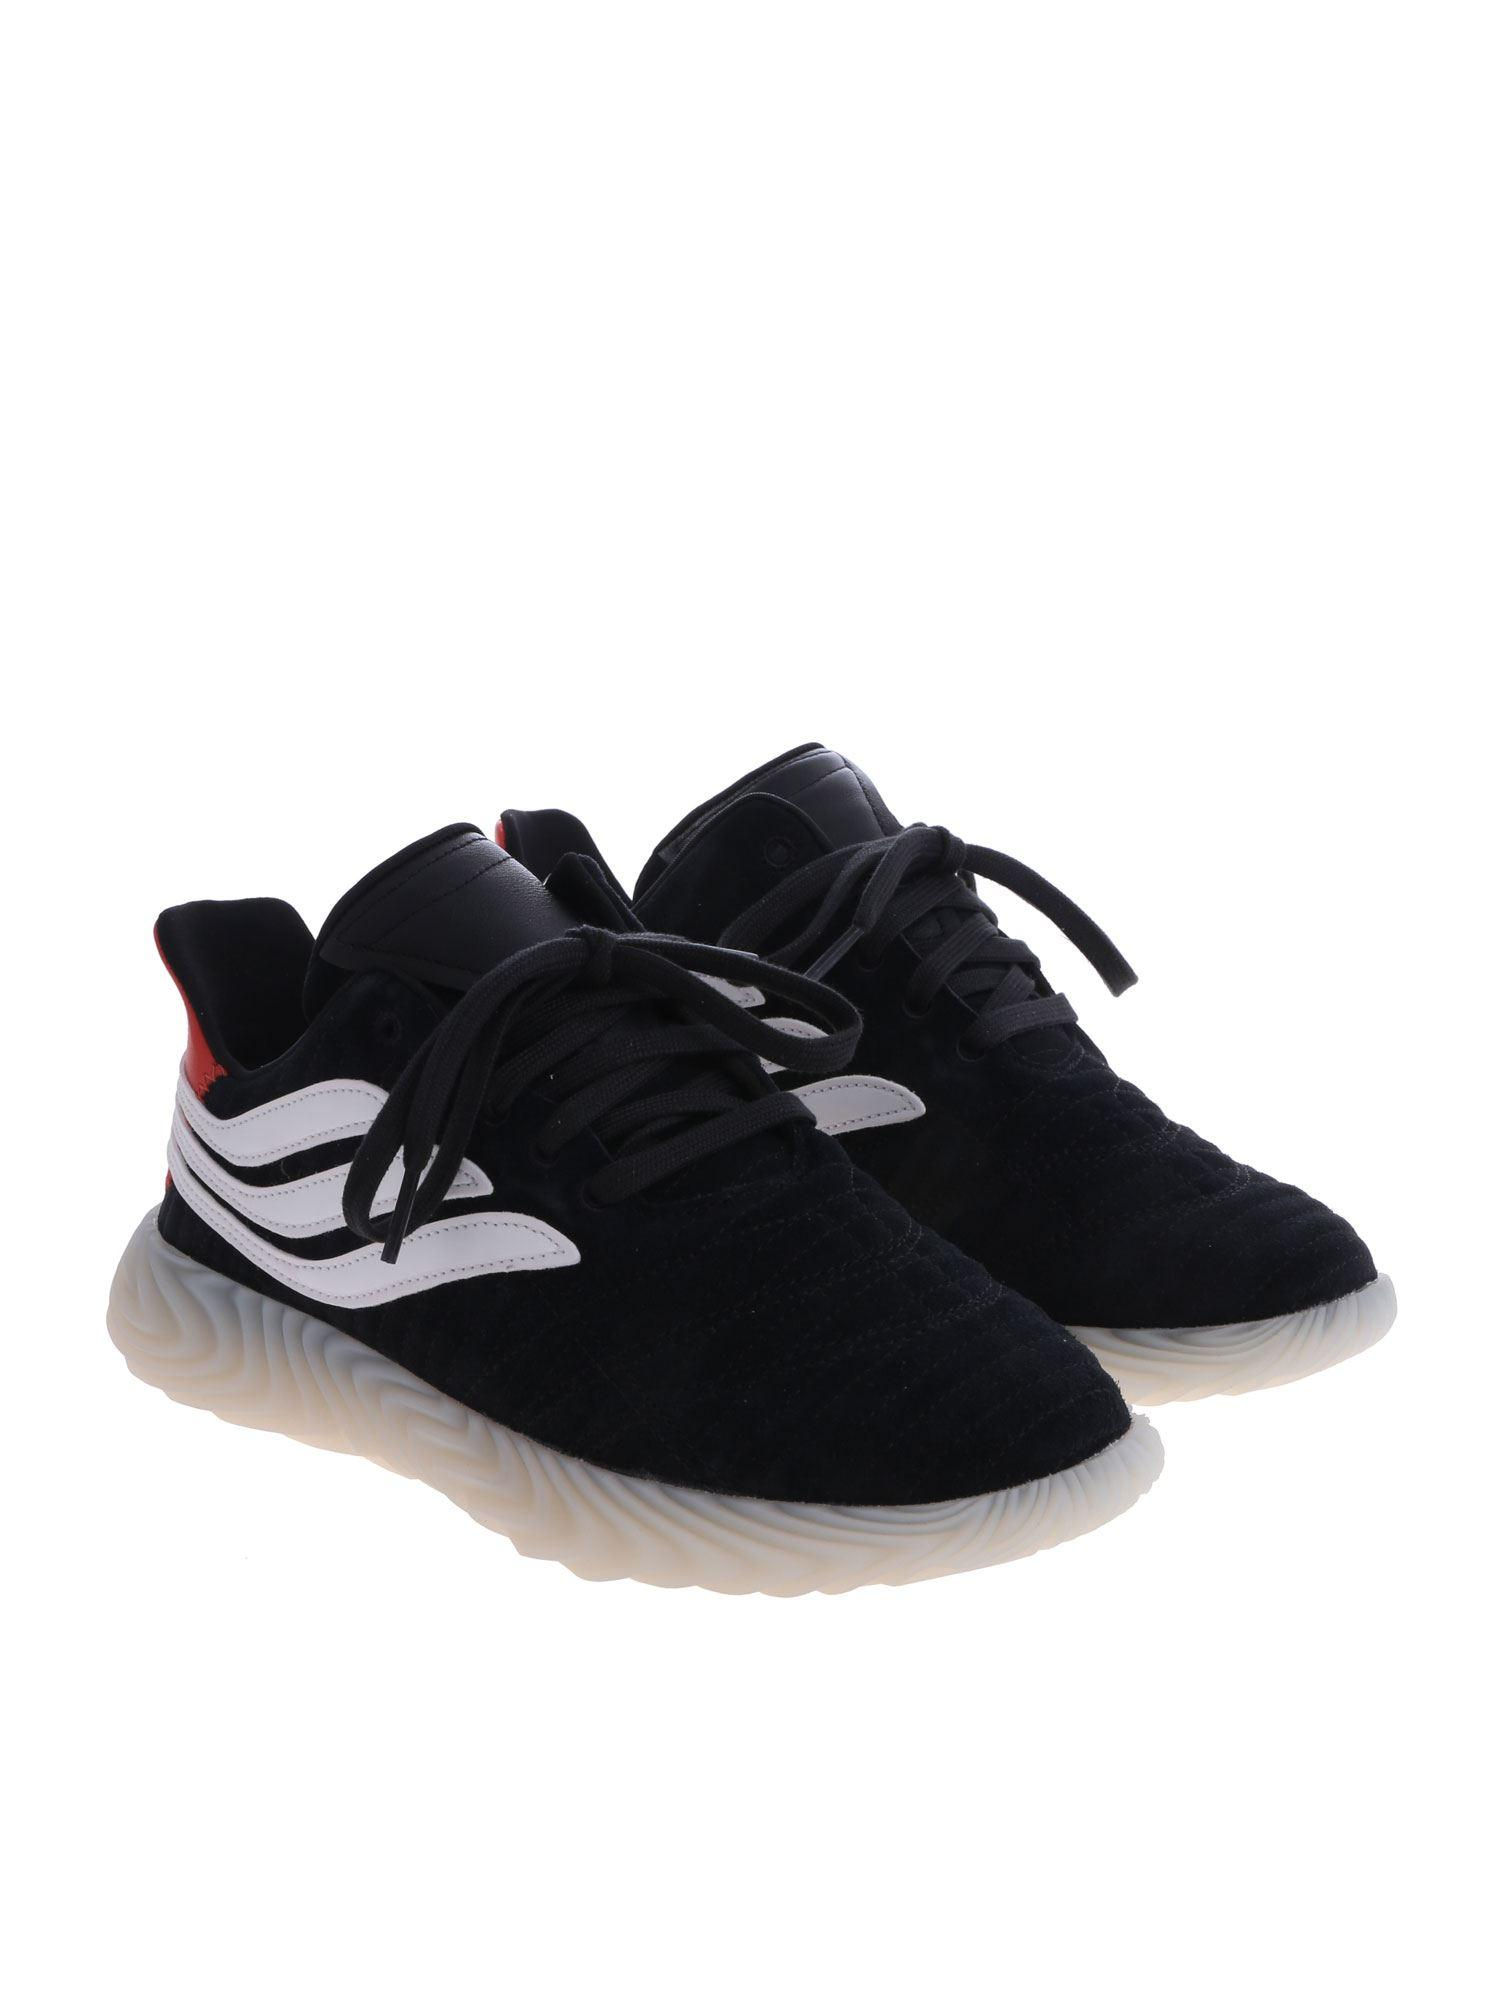 size 40 42697 95158 Lyst - adidas Originals Black Sobakov Sneakers in Black for Men